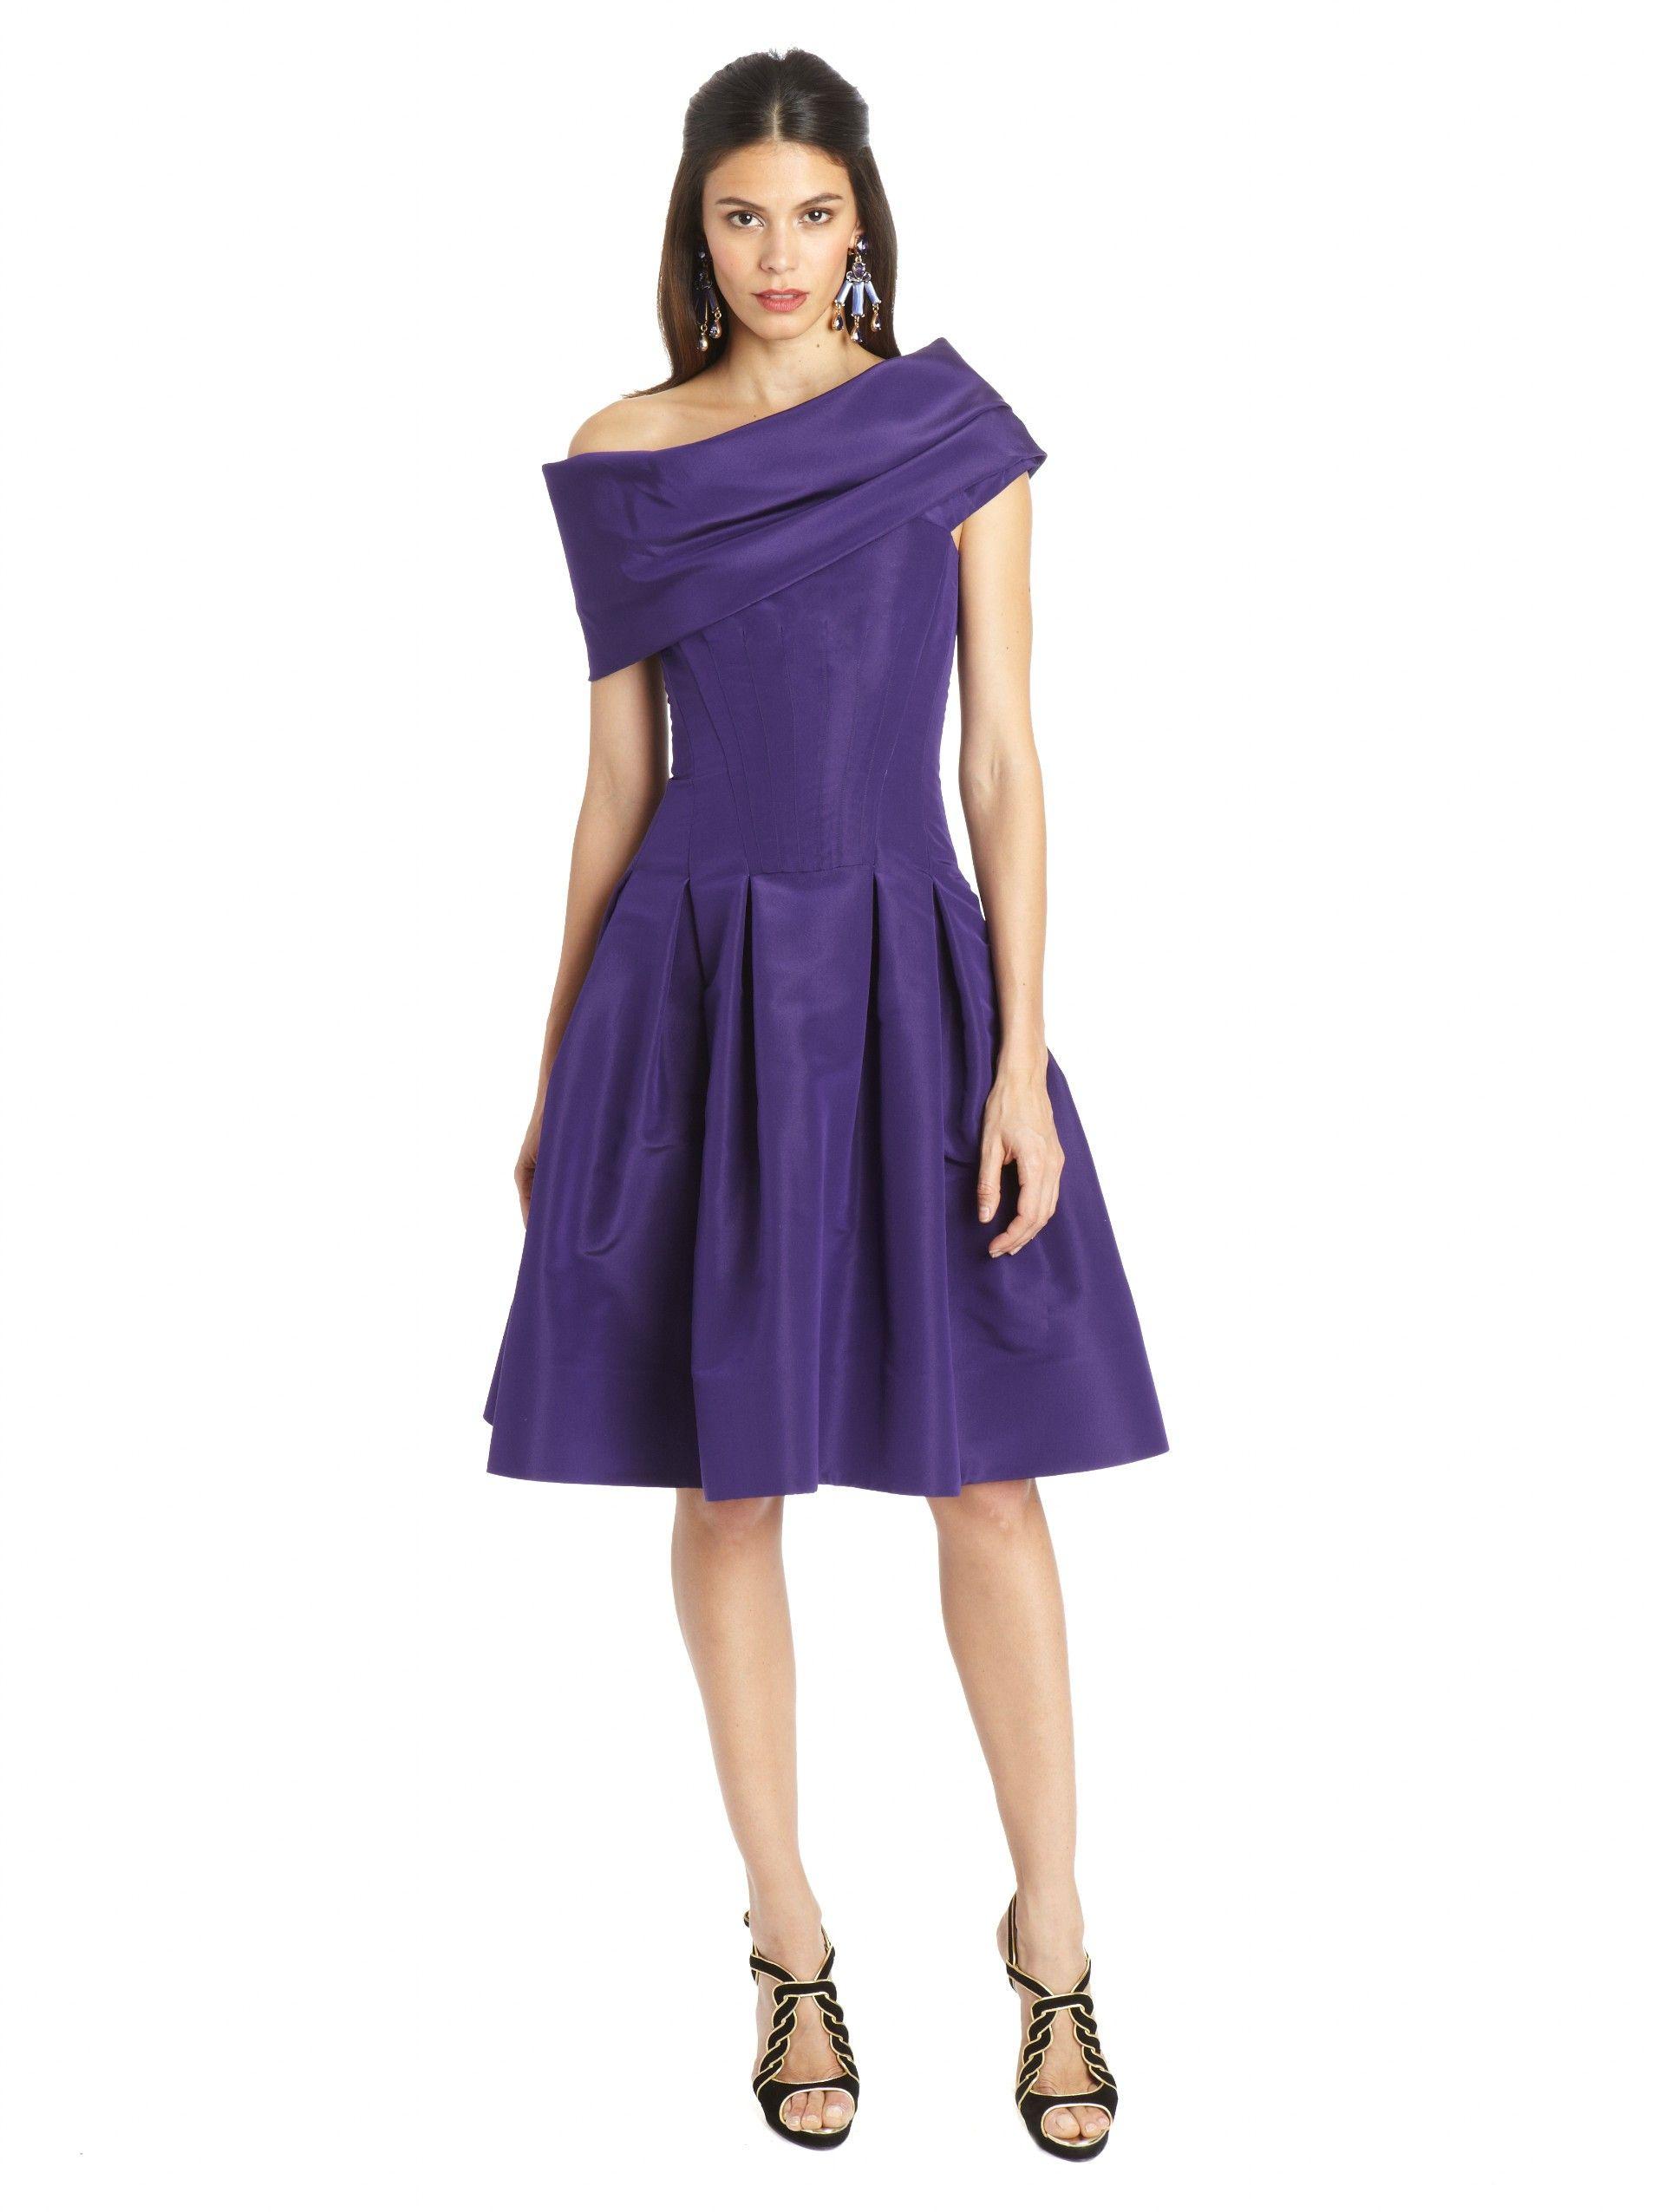 Oscar de la Renta - Silk Faille Cocktail Dress | Abbigliamento ...